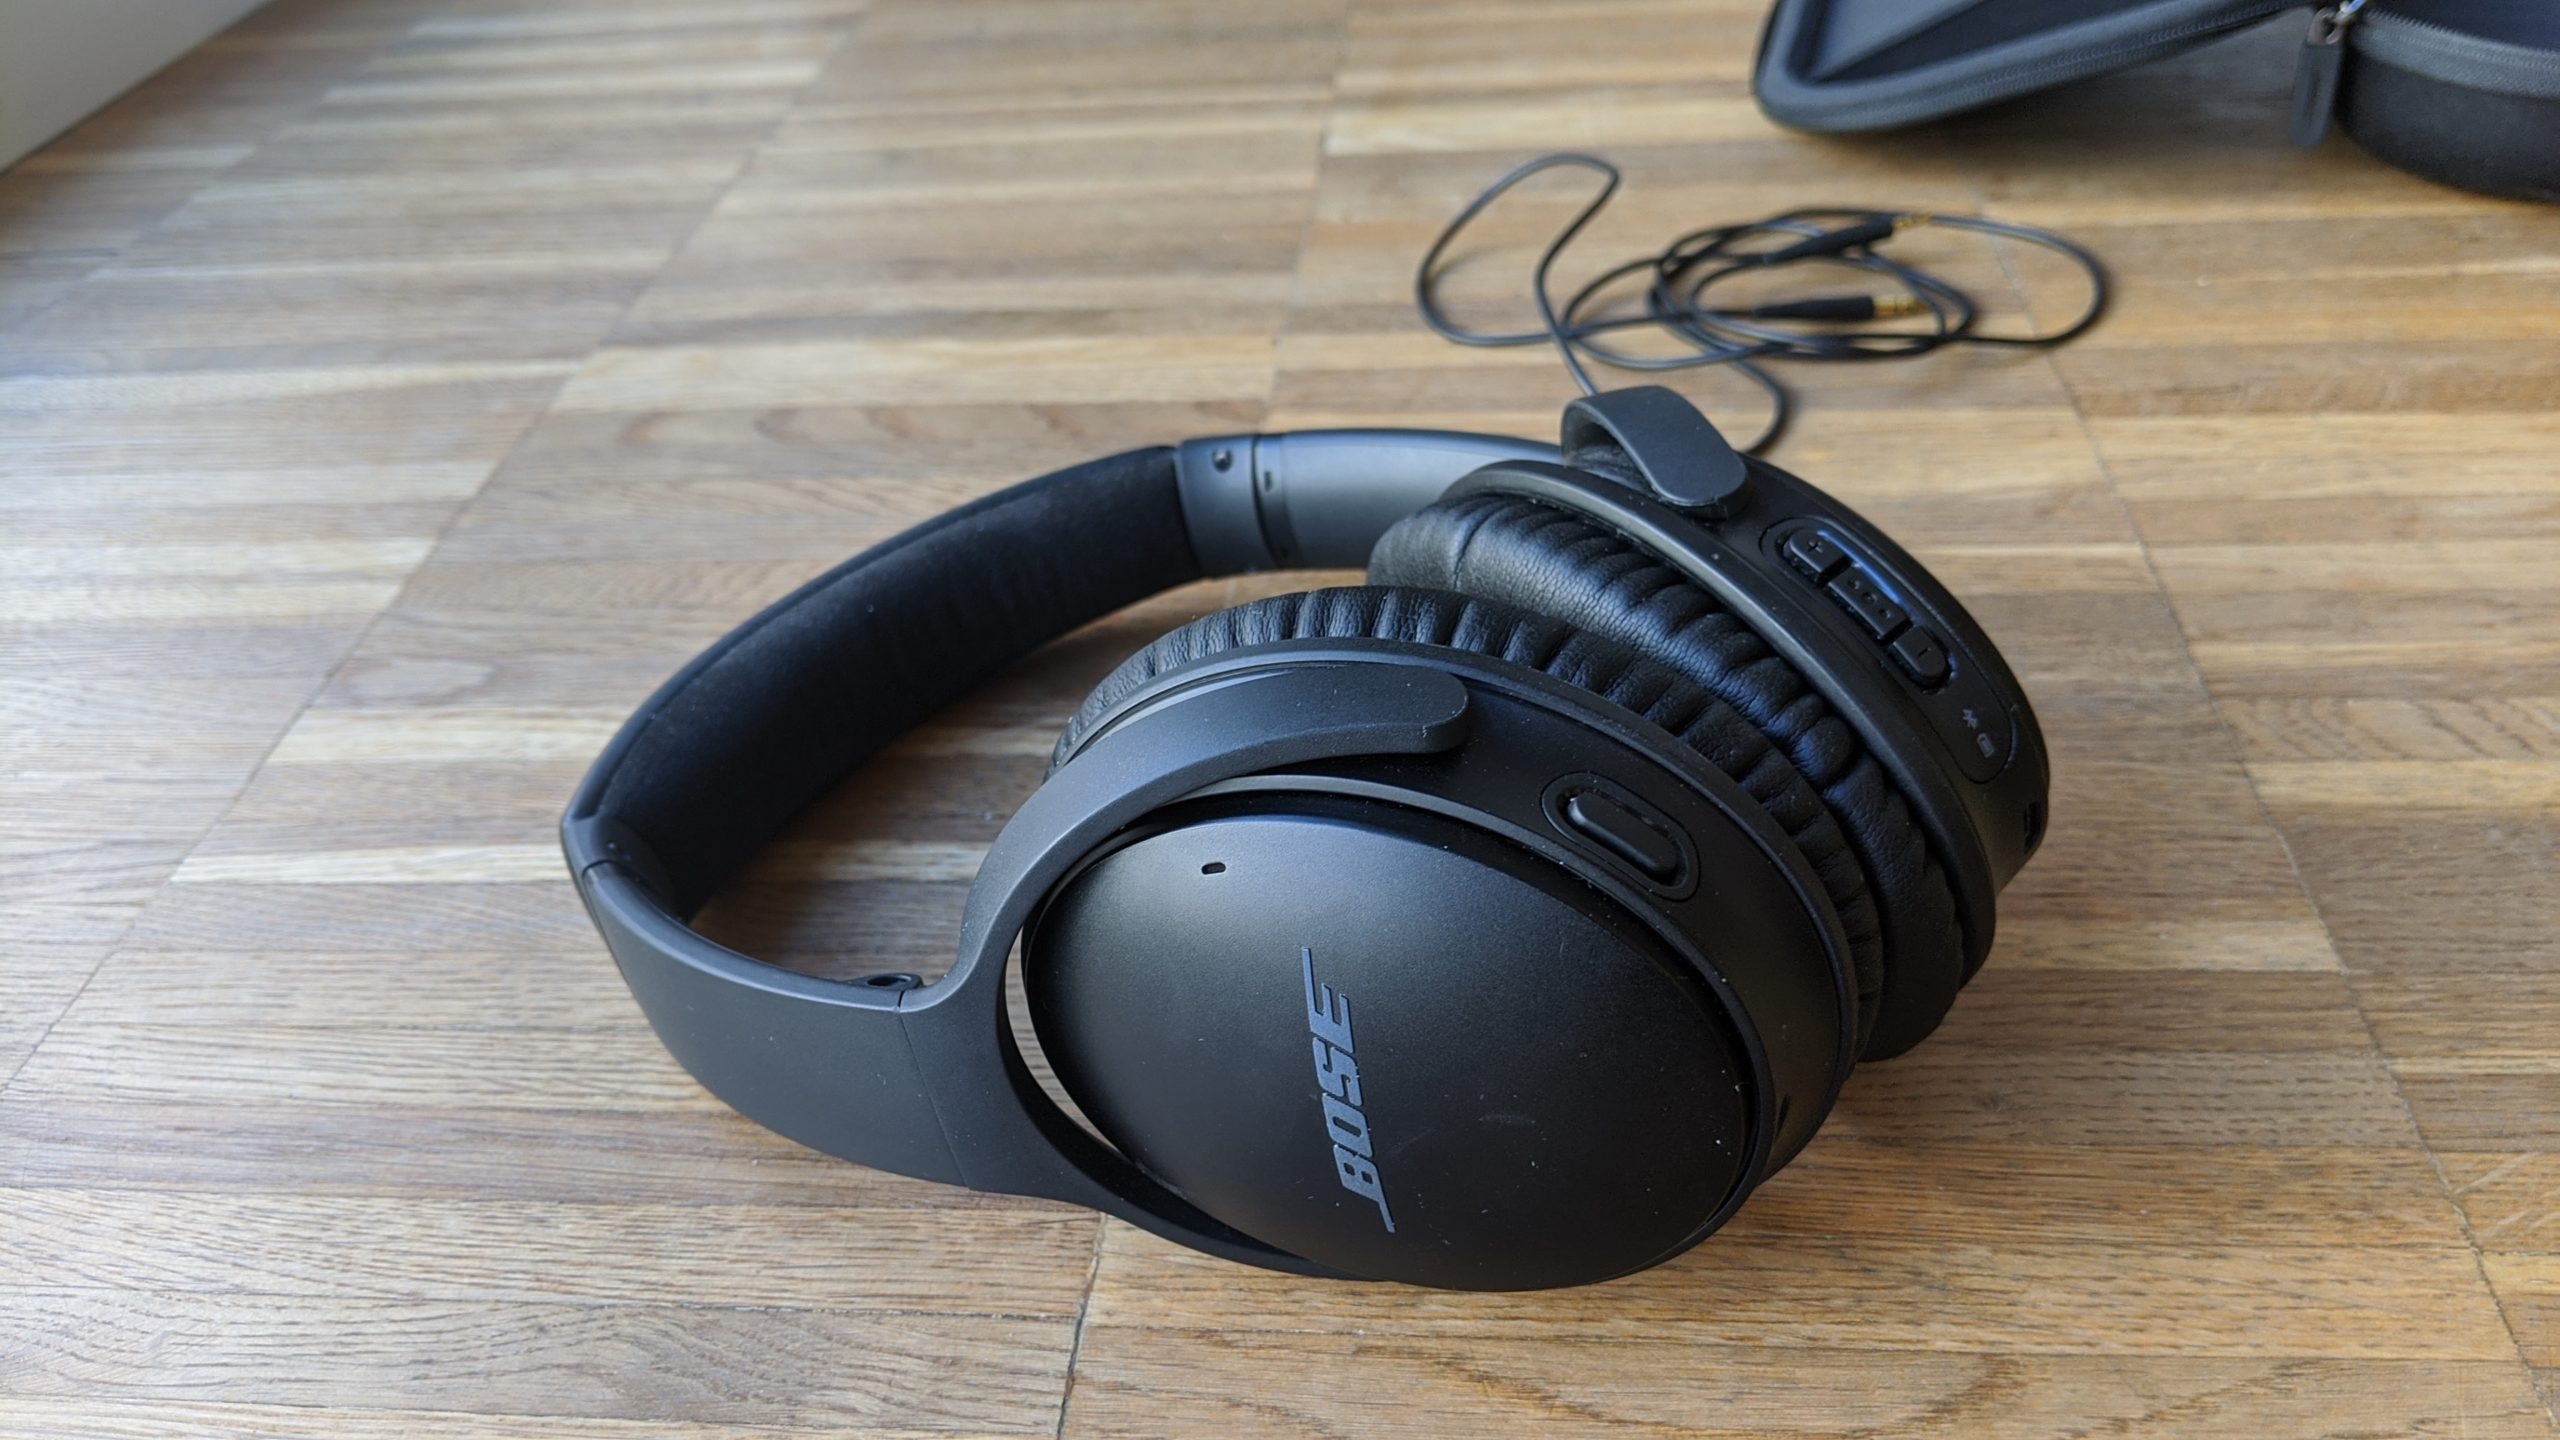 Bose QC35 II Noise-Cancelling Kopfhörer Erfahrung